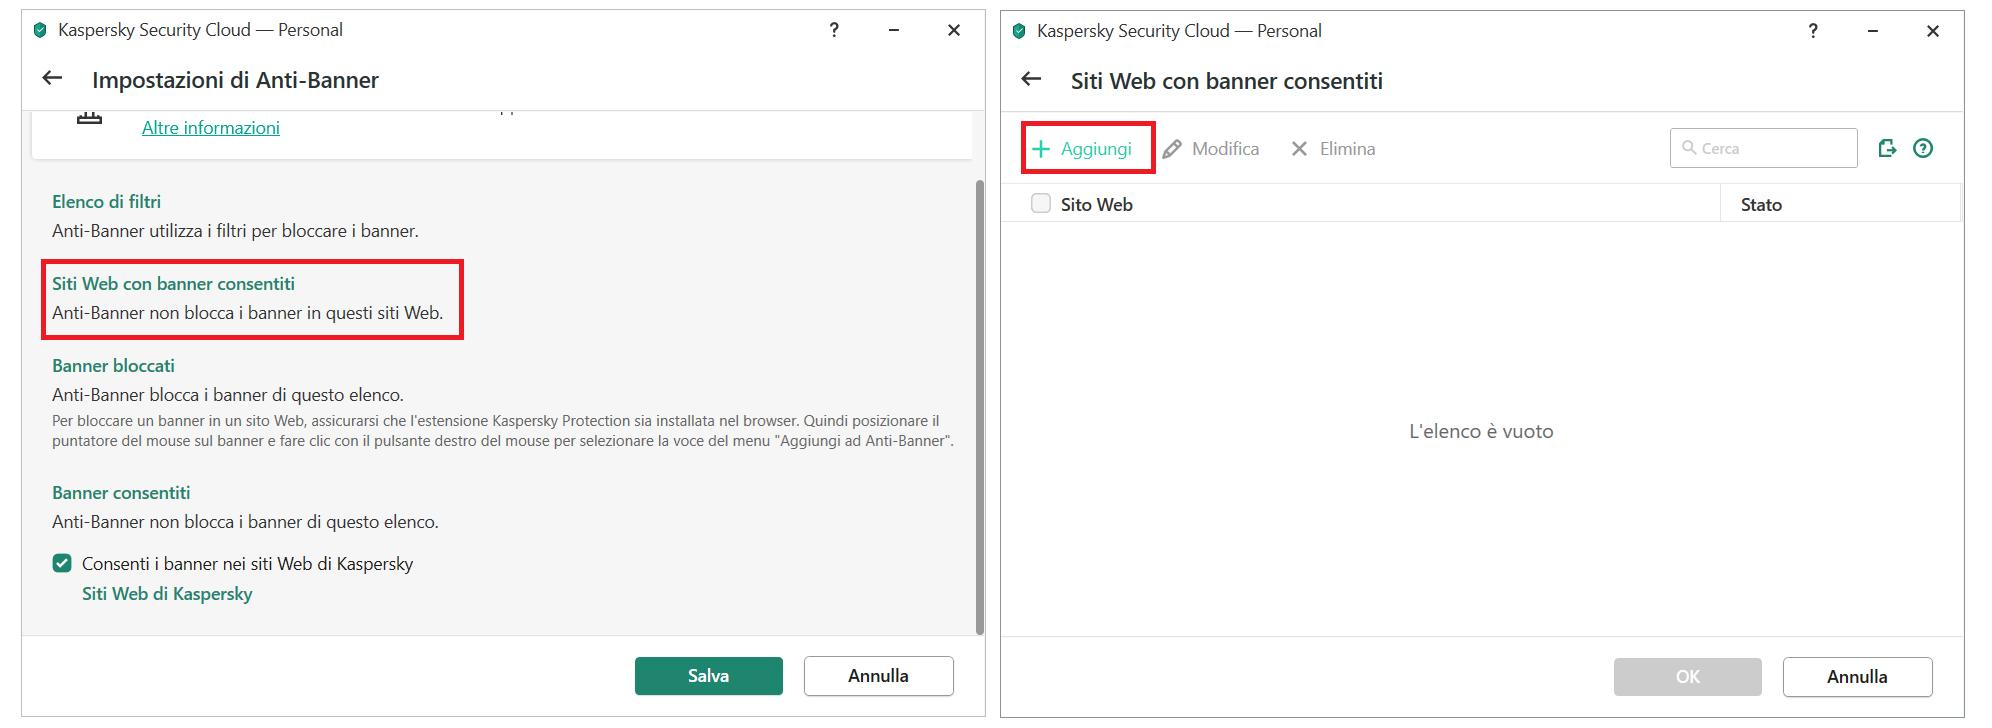 Aggiungere un banner alla lista di permessi su Kaspersky Security Cloud